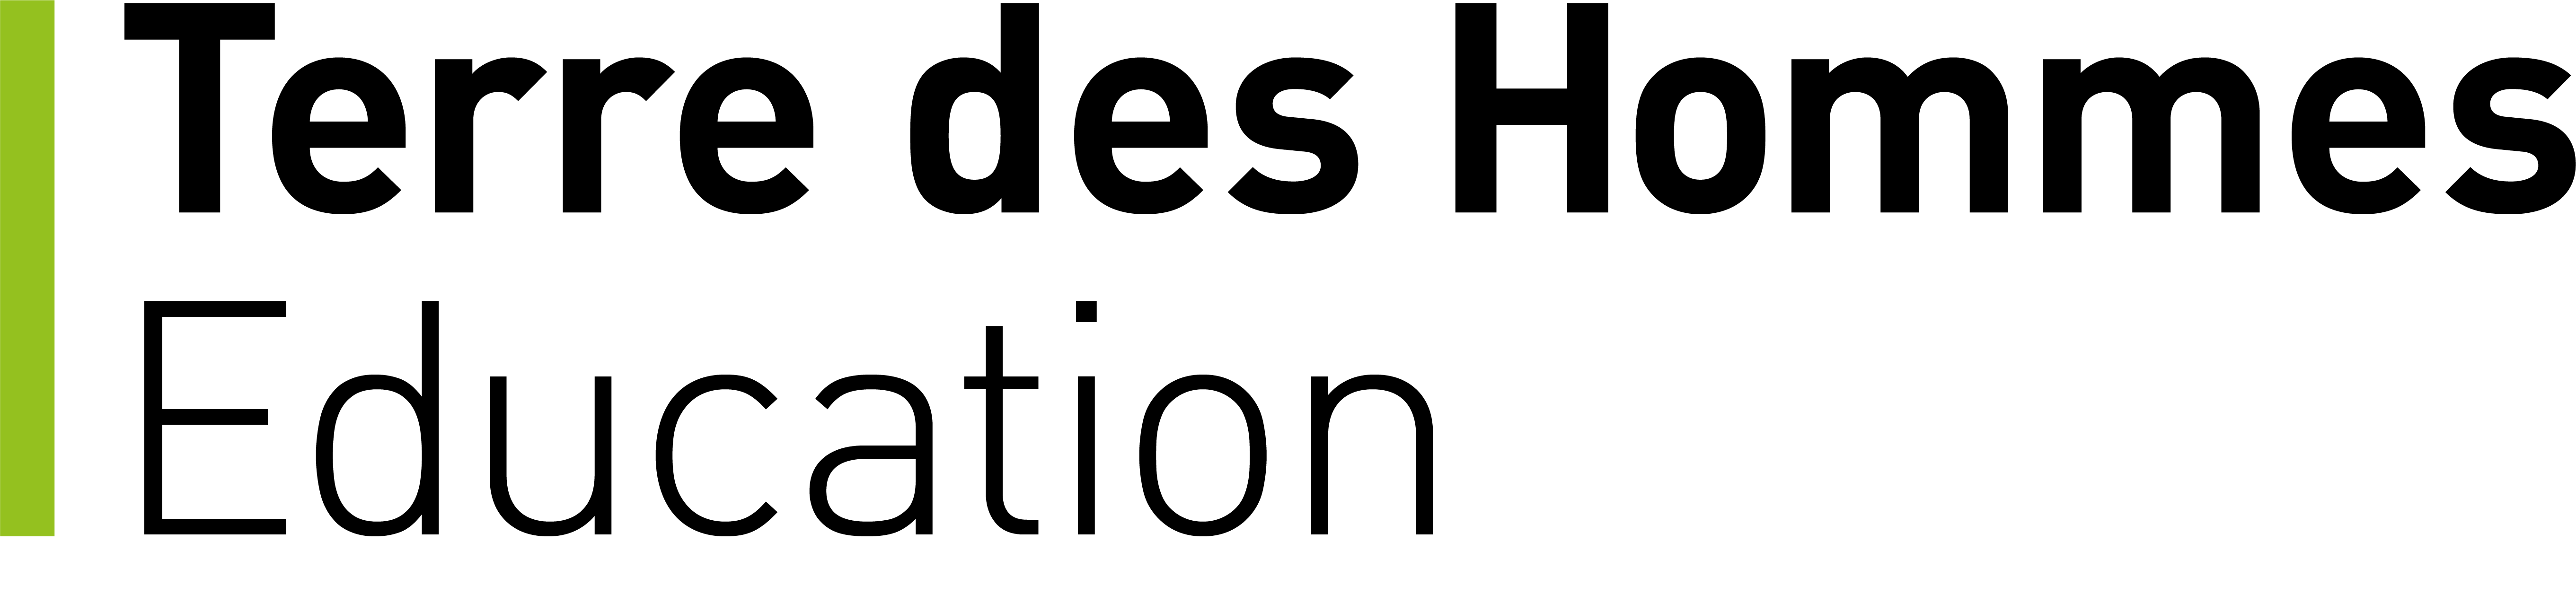 TDH education